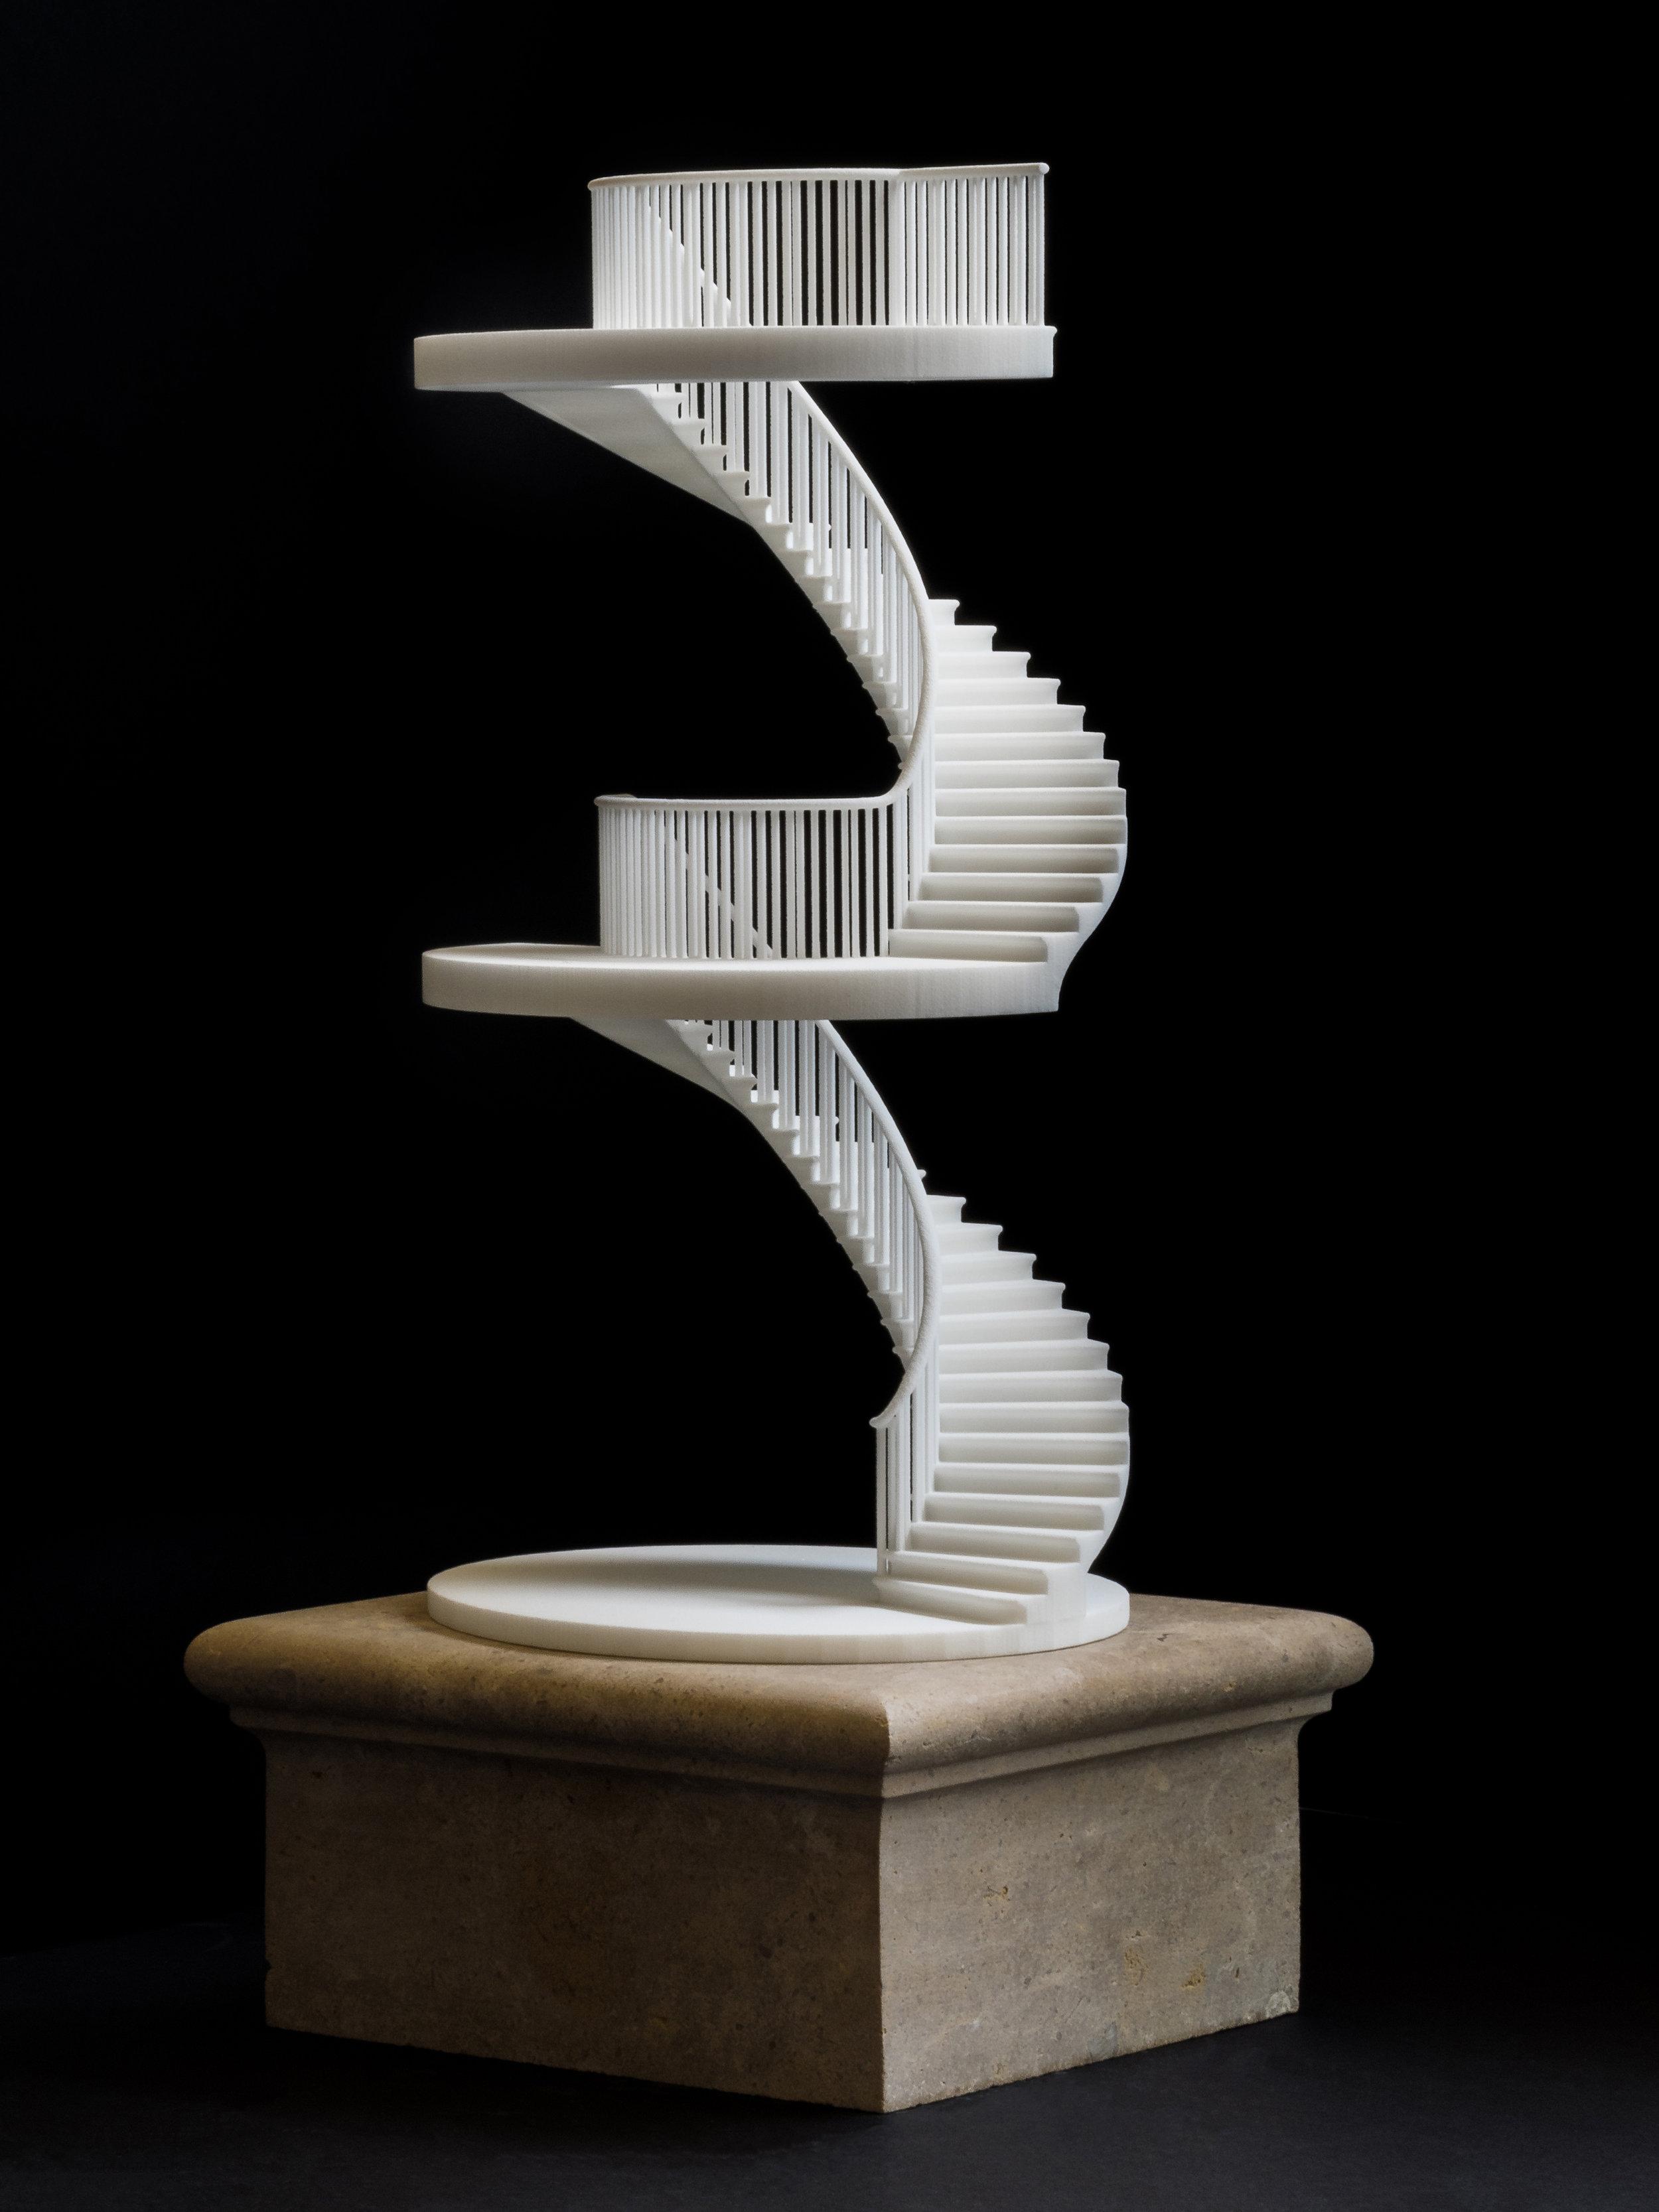 Charlton Brown Architects - Stair Model - 385 x 190 x 165mm.jpg